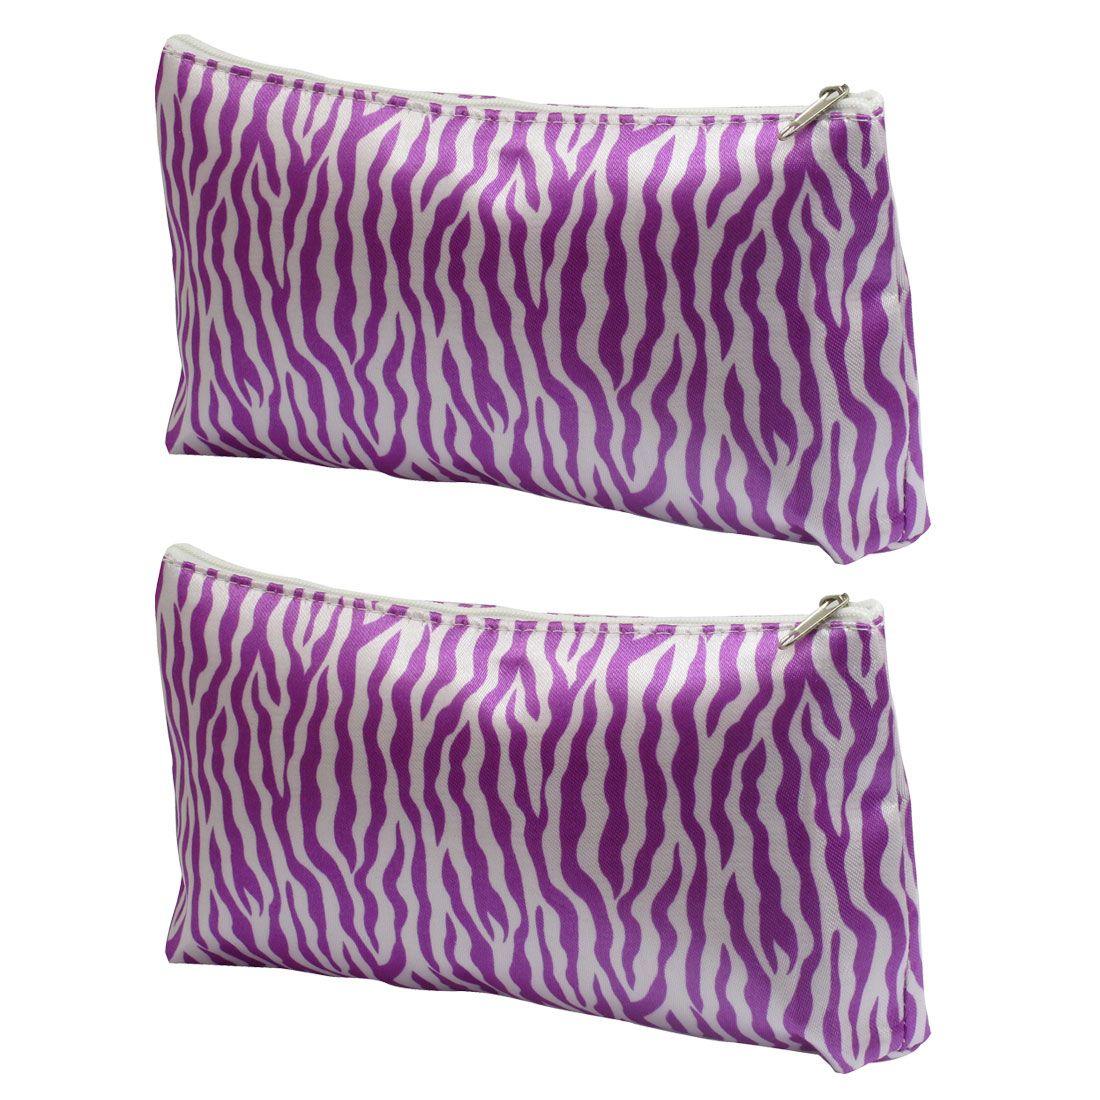 Zebra Cosmetic Bags Wholesale Pocket Zipper Closure